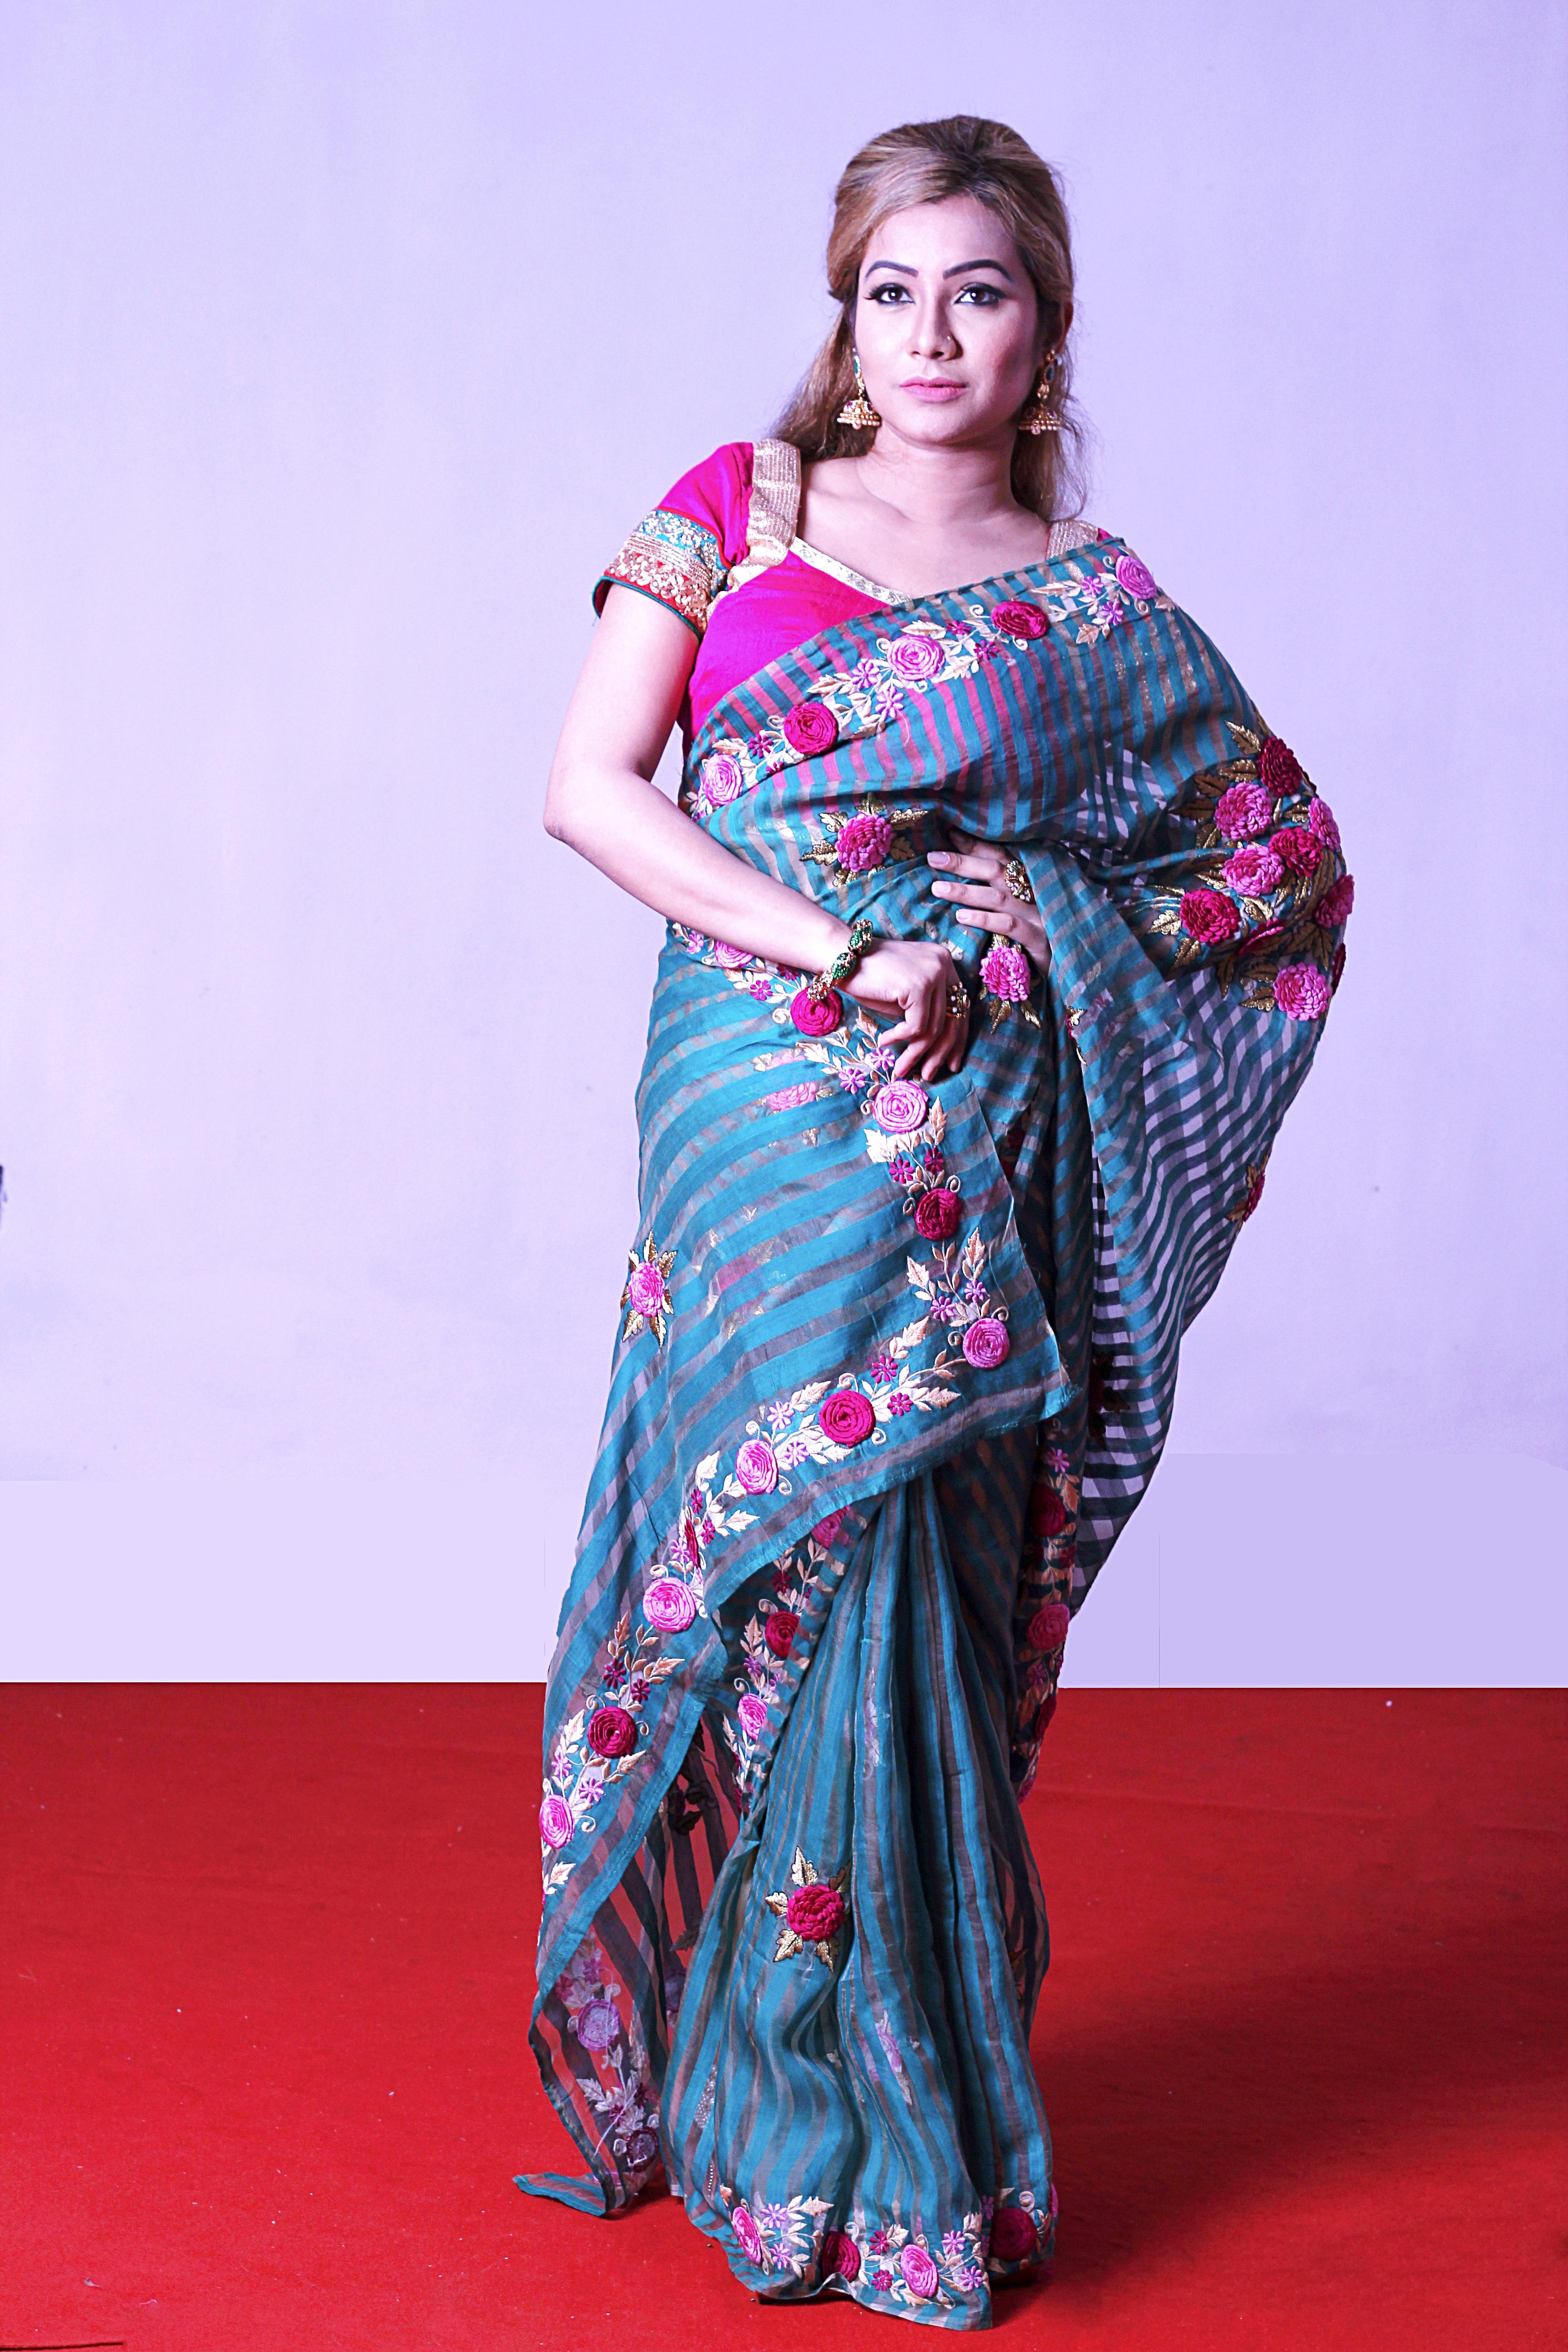 Free Images : female, model, clothing, dress, women, sari, magenta ...